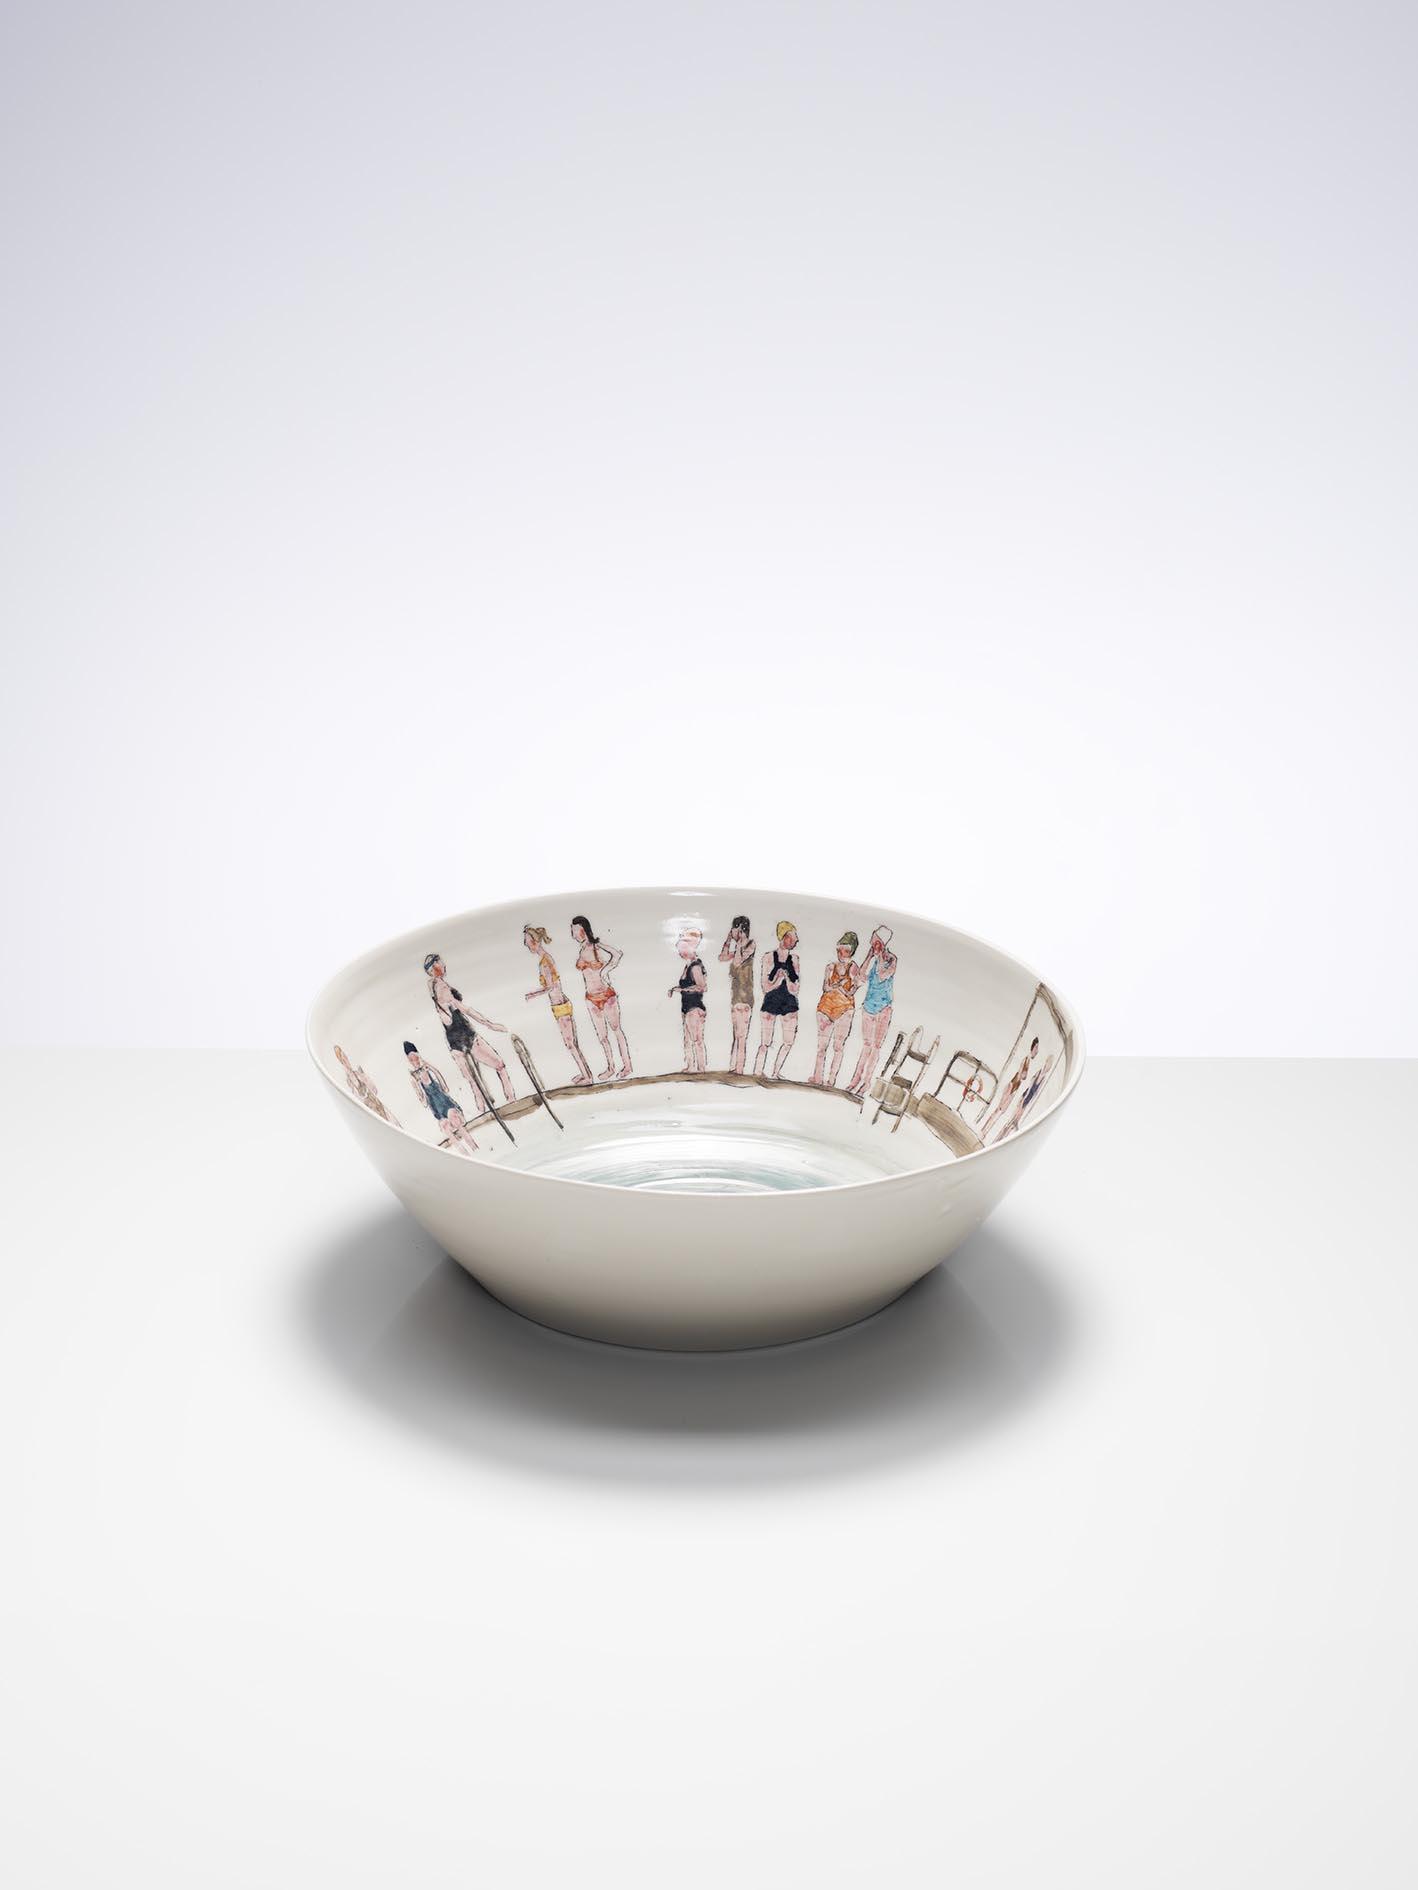 Ladies' Pond at Hampstead, 2017, wheel-thrown and hand-painted porcelain, 35cm diameter